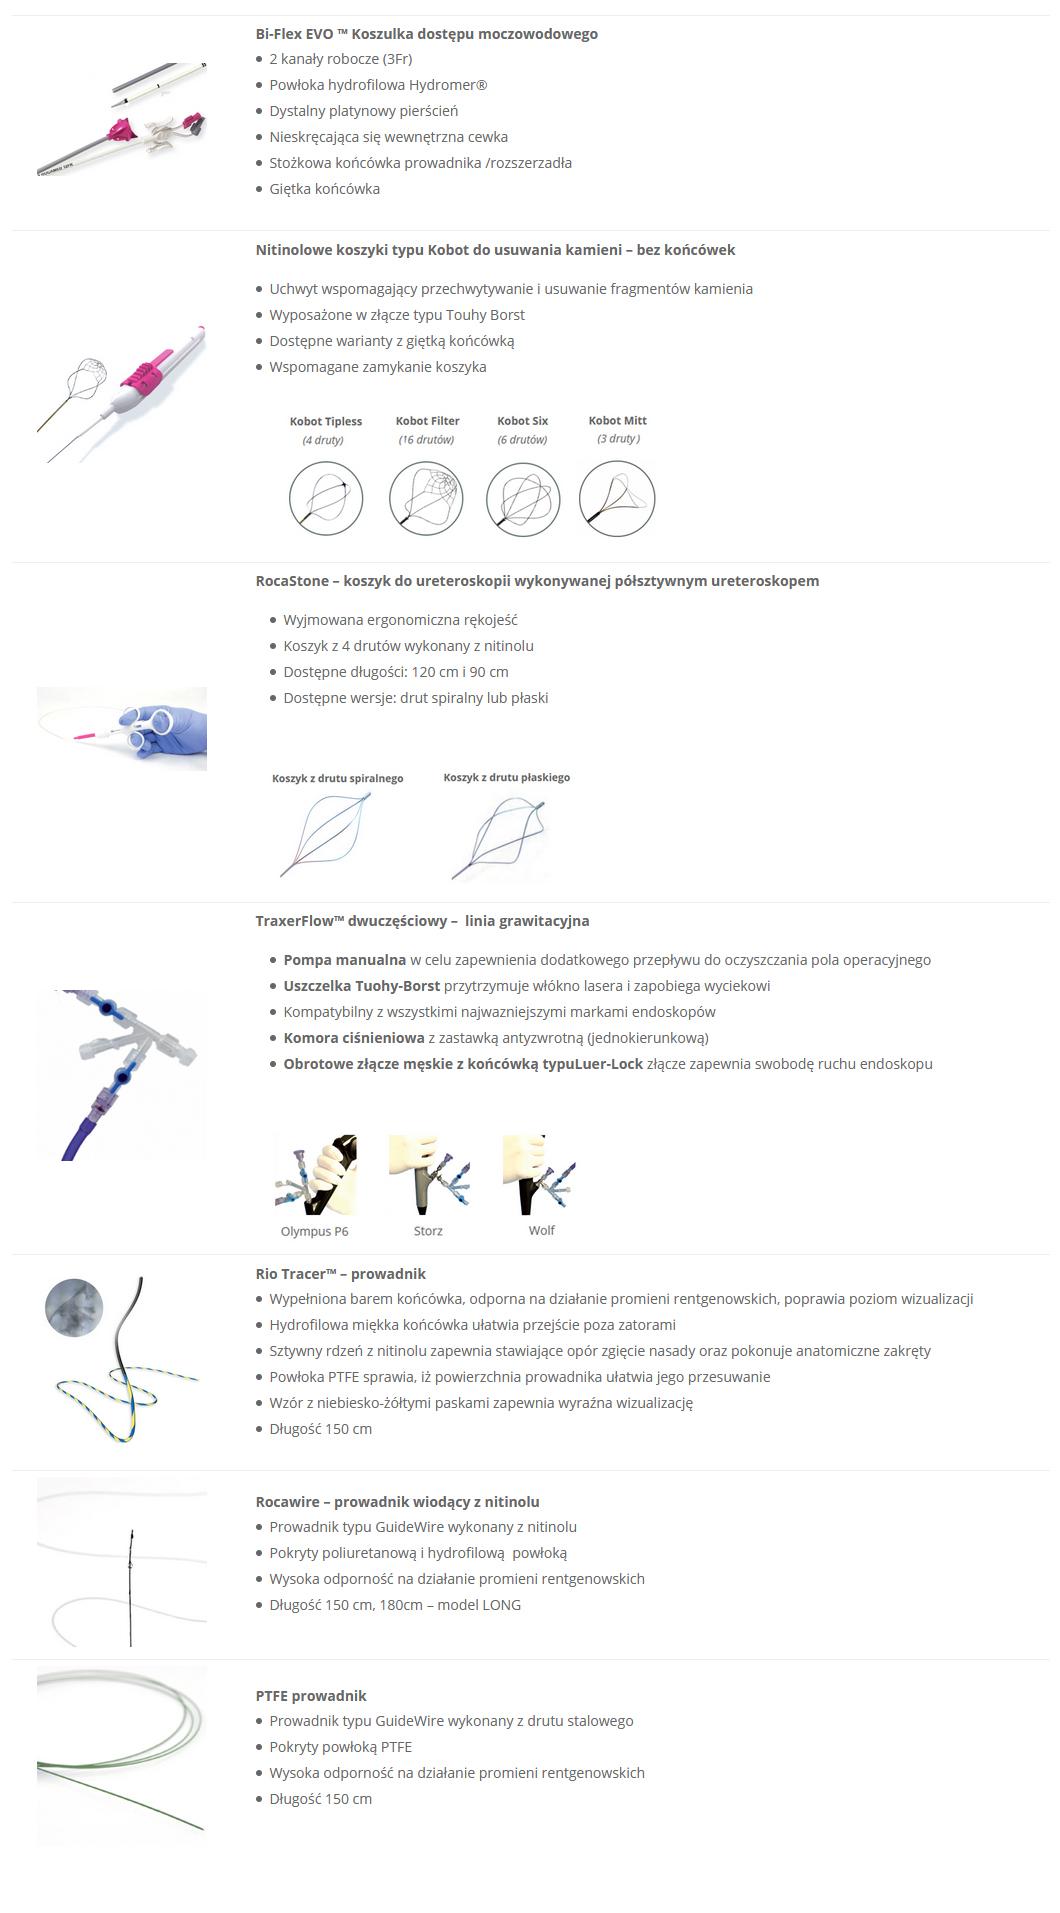 gastroskopy